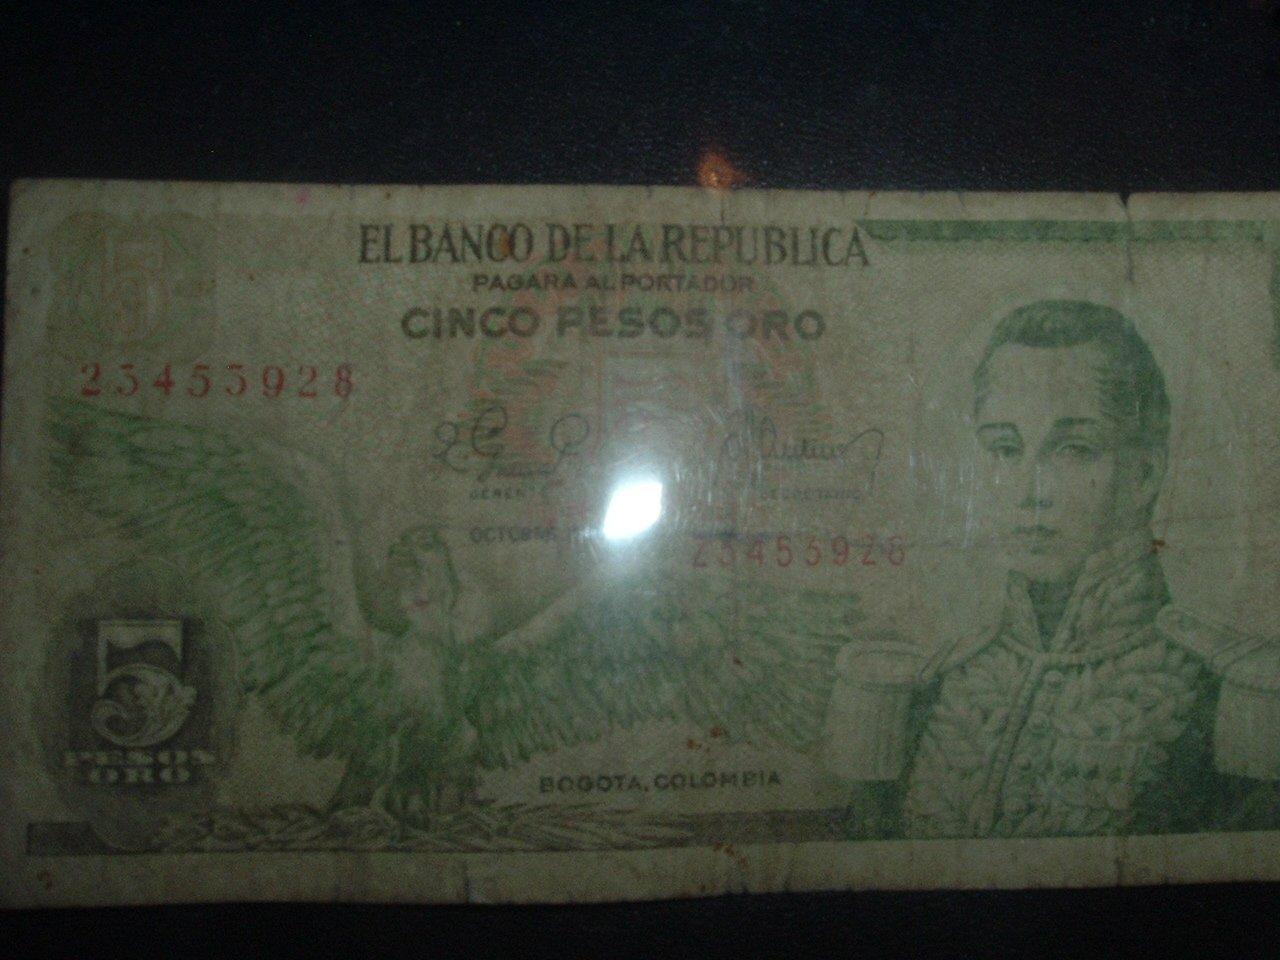 Cinco Pesos Oro  (GOLD) Circulated Colombian Paper Money